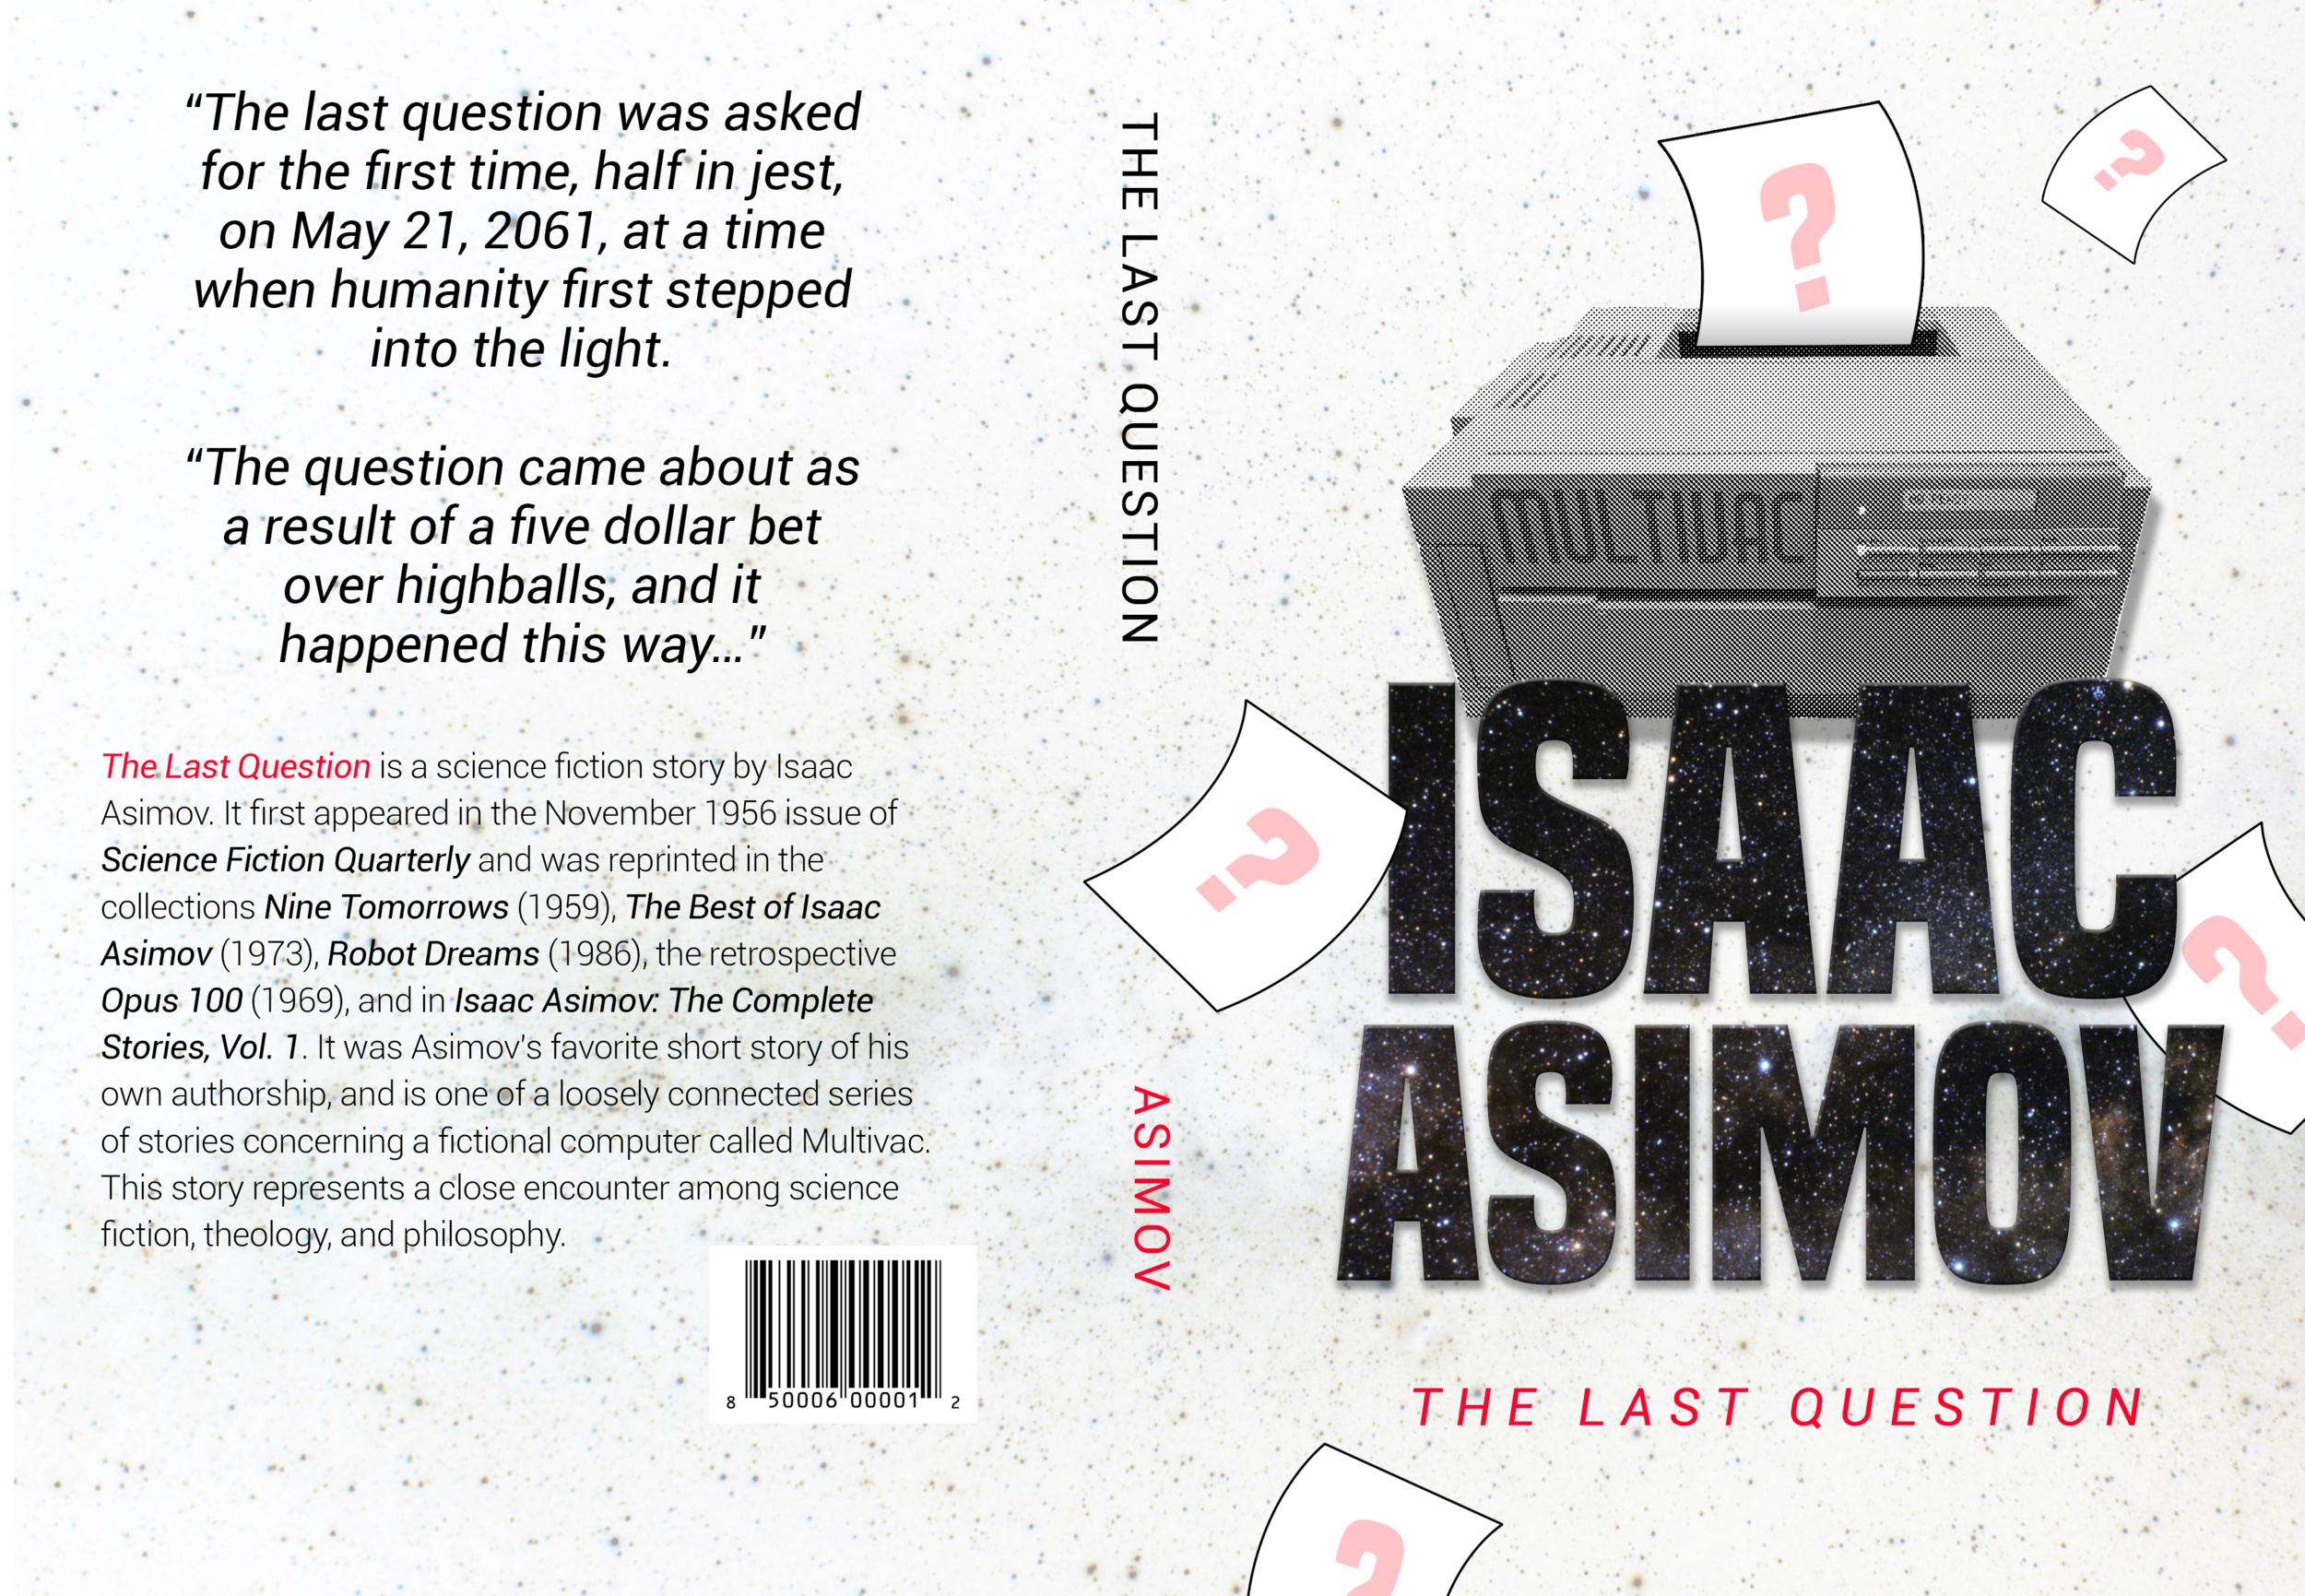 asimov book cover 2.png